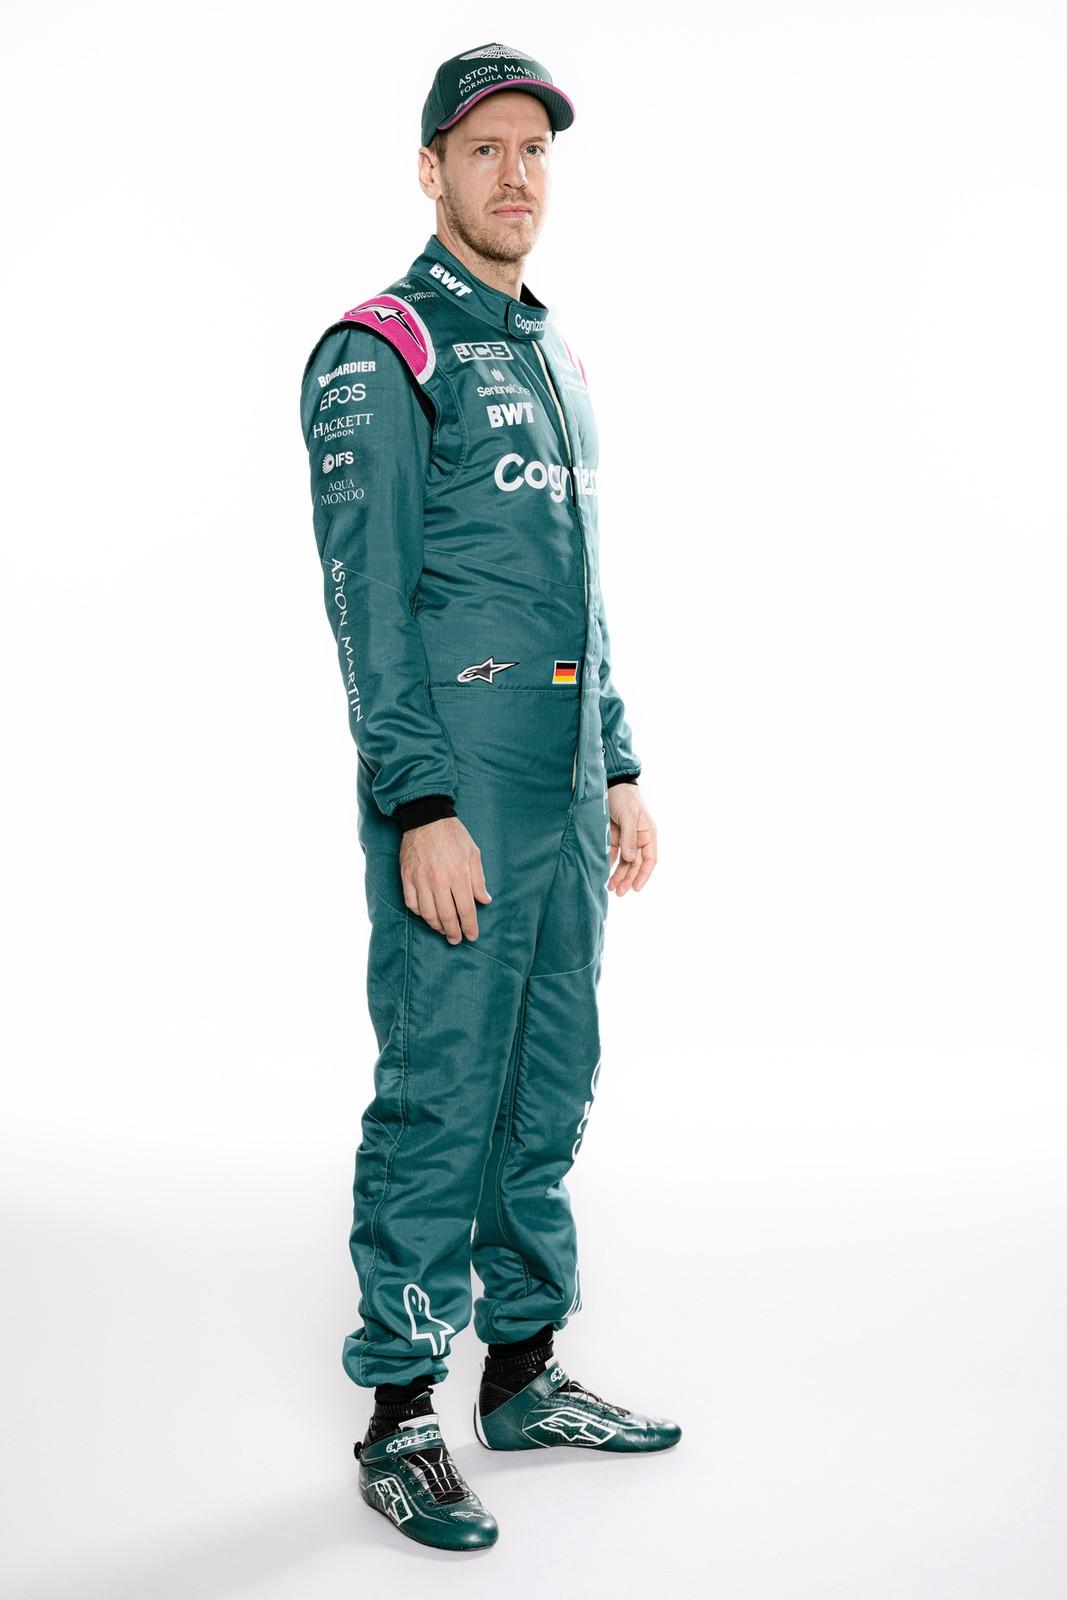 Aston Martin F1 Driver Studio Shoot